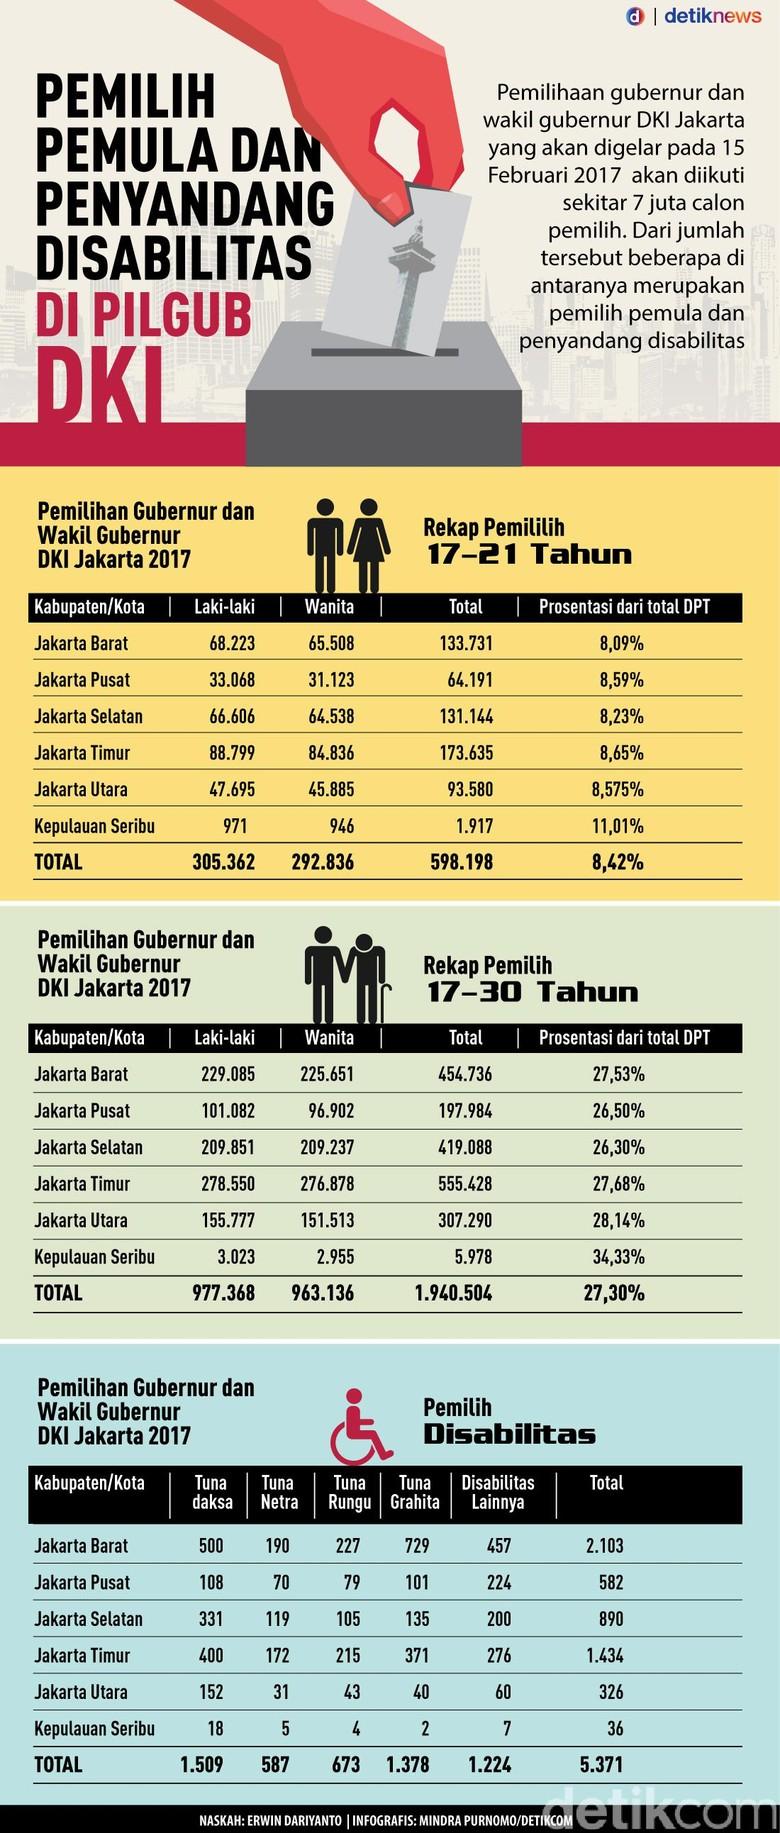 Data Pemilih Pemula dan Penyandang Disabilitas di Pilgub DKI